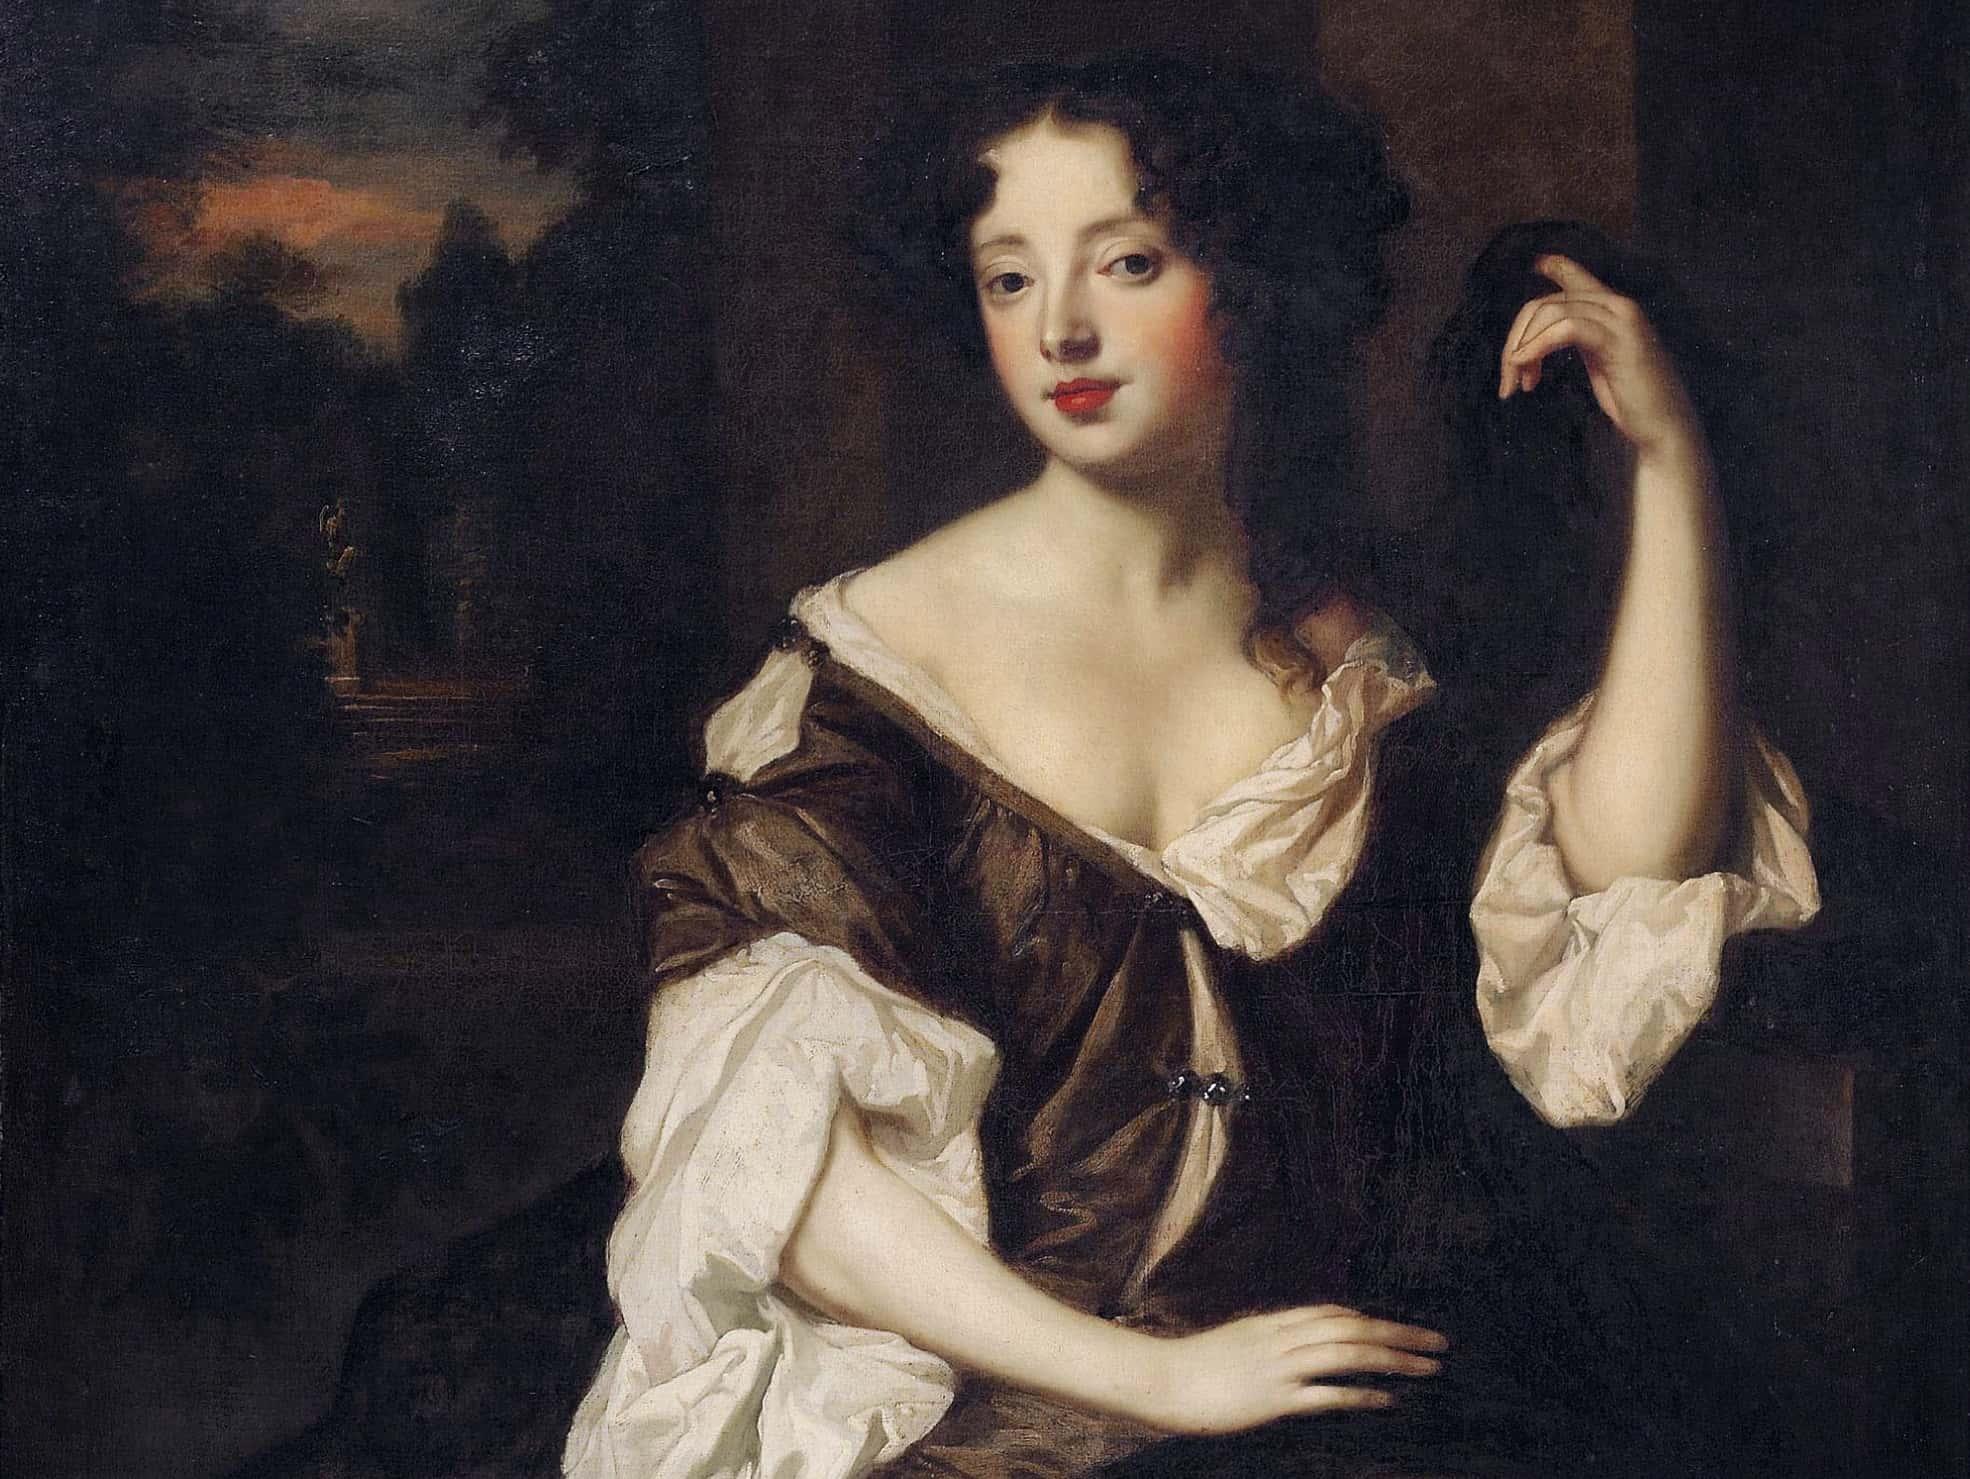 Barbara Palmer Was History's Most Notorious Mistress—For Good Reason